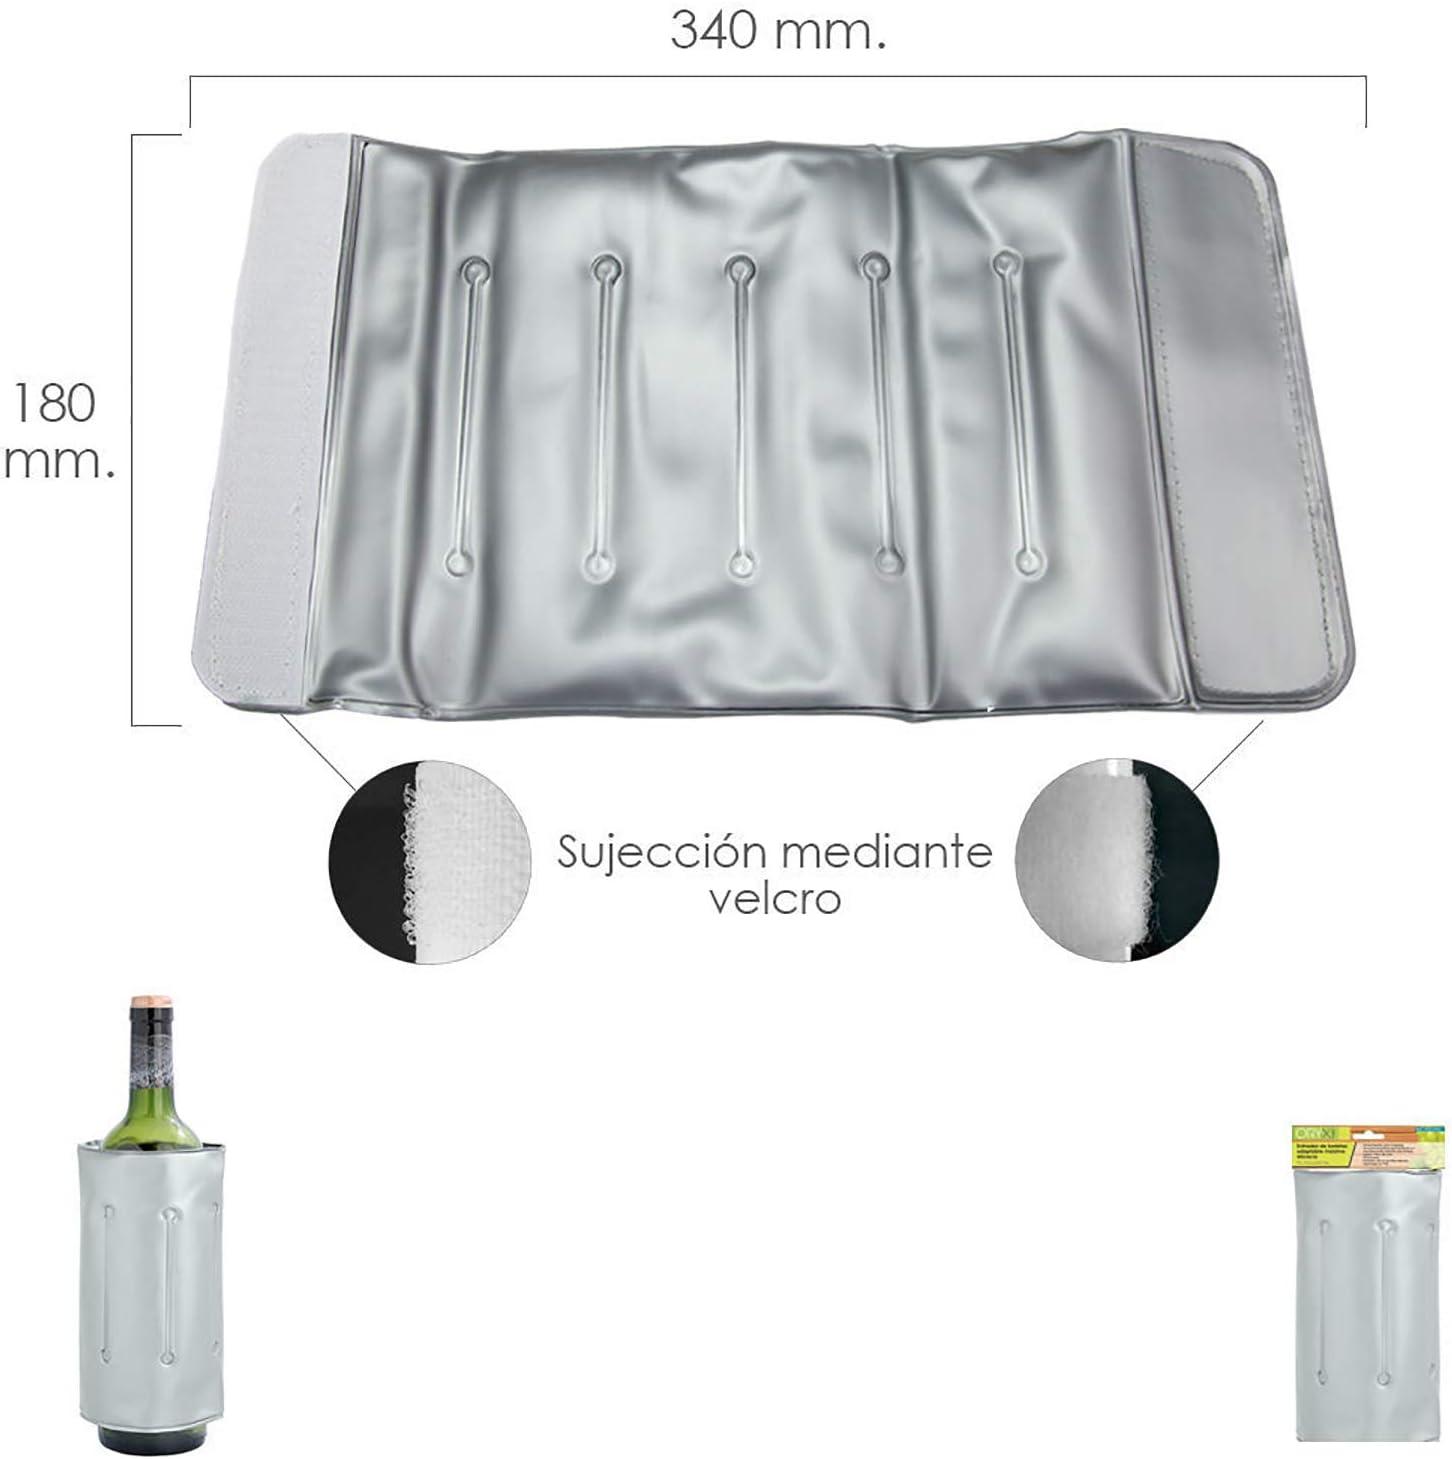 ORYX 5057050 Enfriador De Botellas Adaptable Maxima Eficacia, Plateado